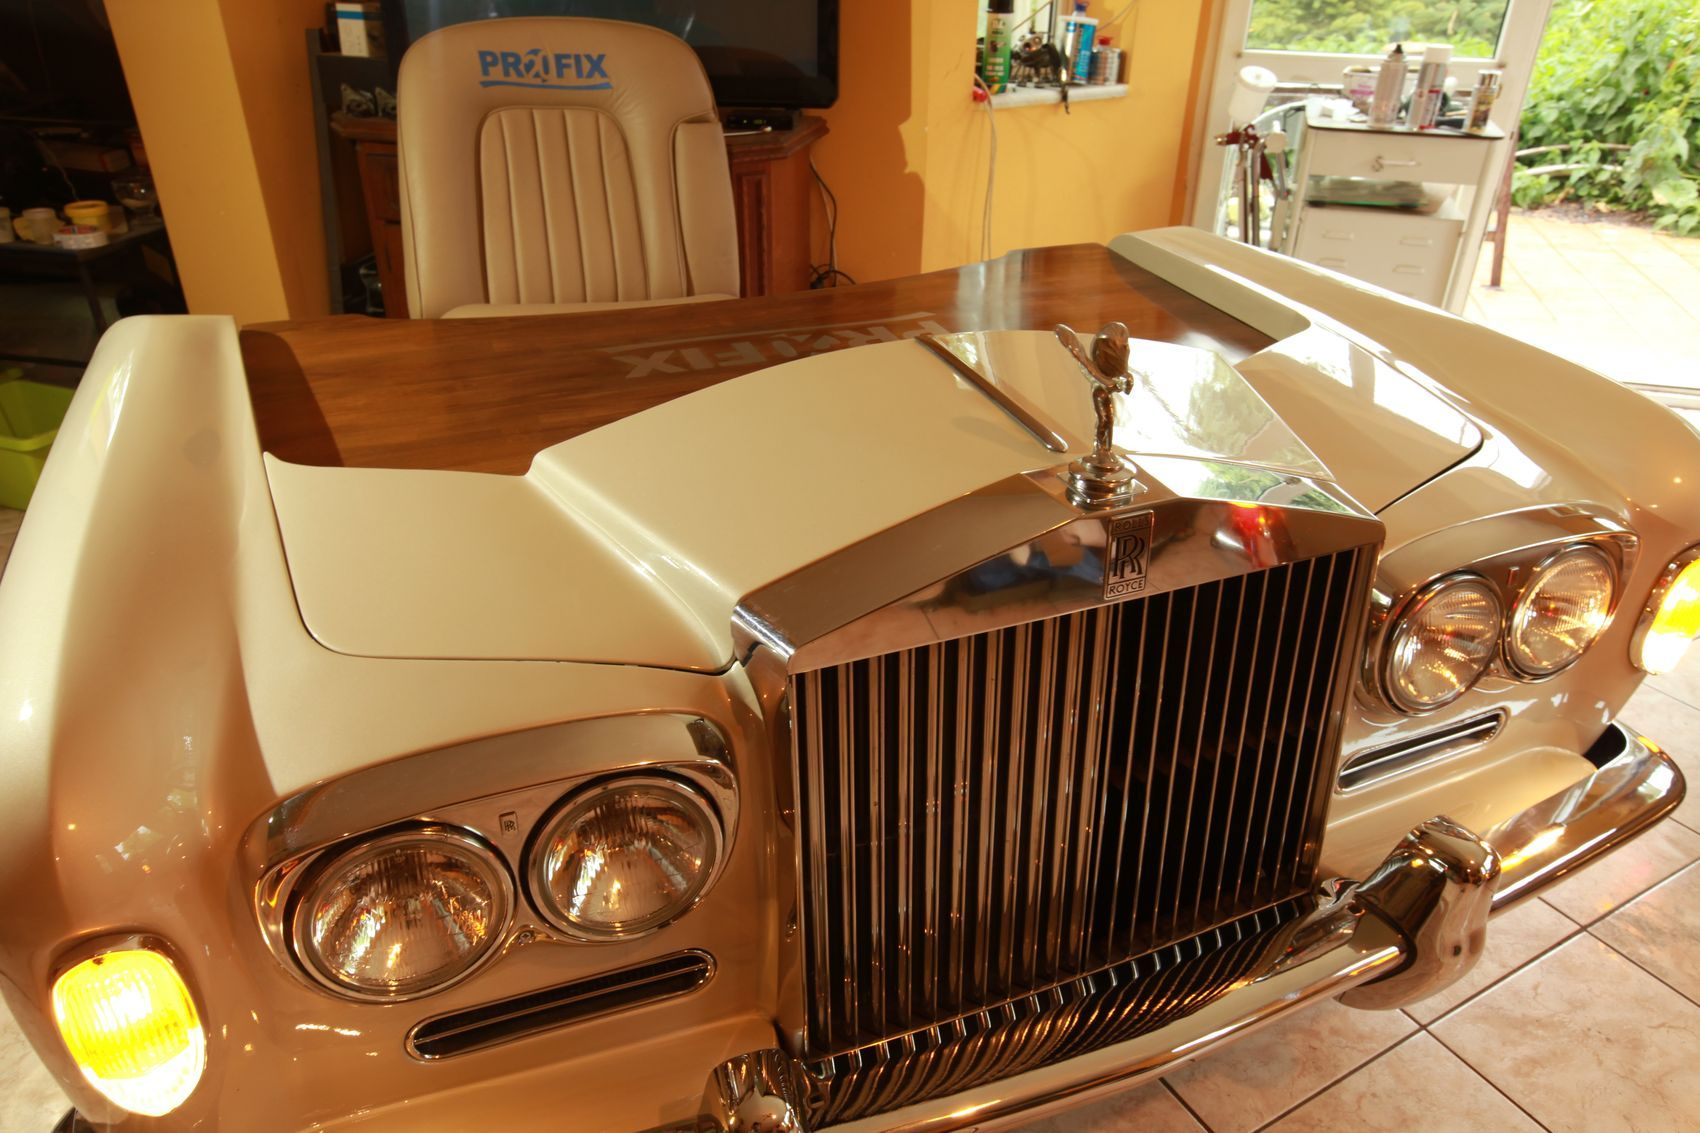 Car Desks Rolls Royce Sofa Couch Rolls Royce Desk Table Rolls Royce 1965